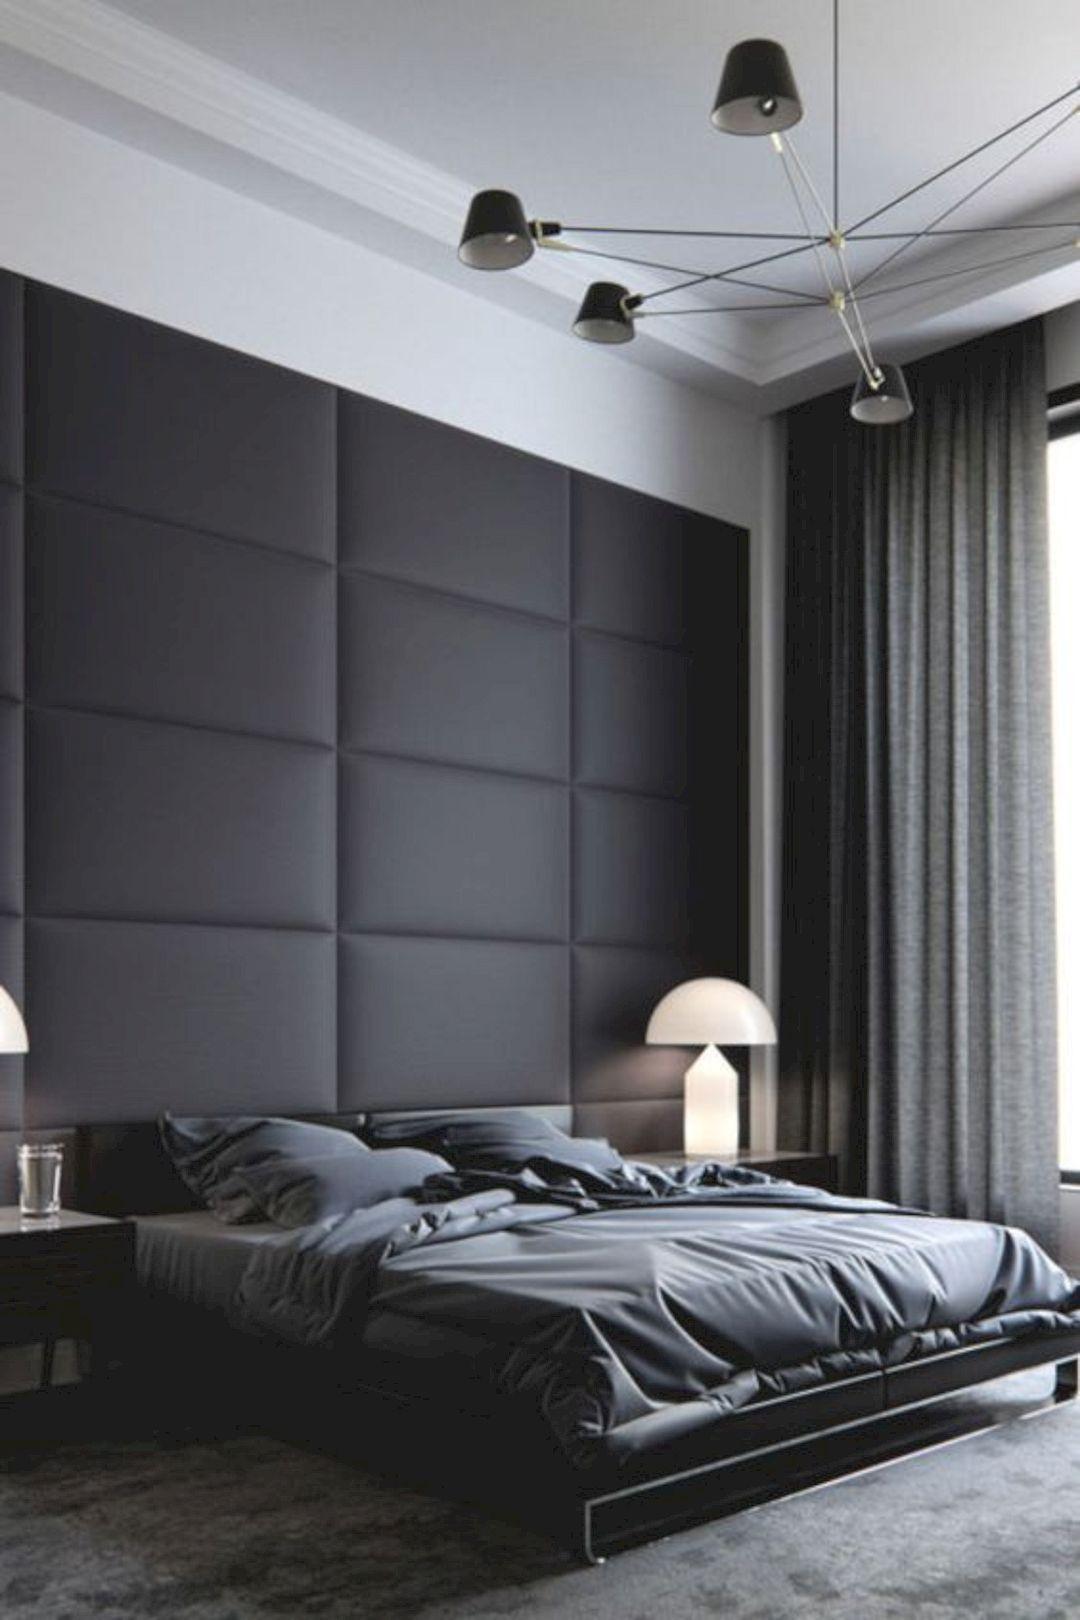 Unique Bedroom Design Ideas Interesting 16 Cool Bedroom Interior Design Ideas  Basement Decorating Ideas Inspiration